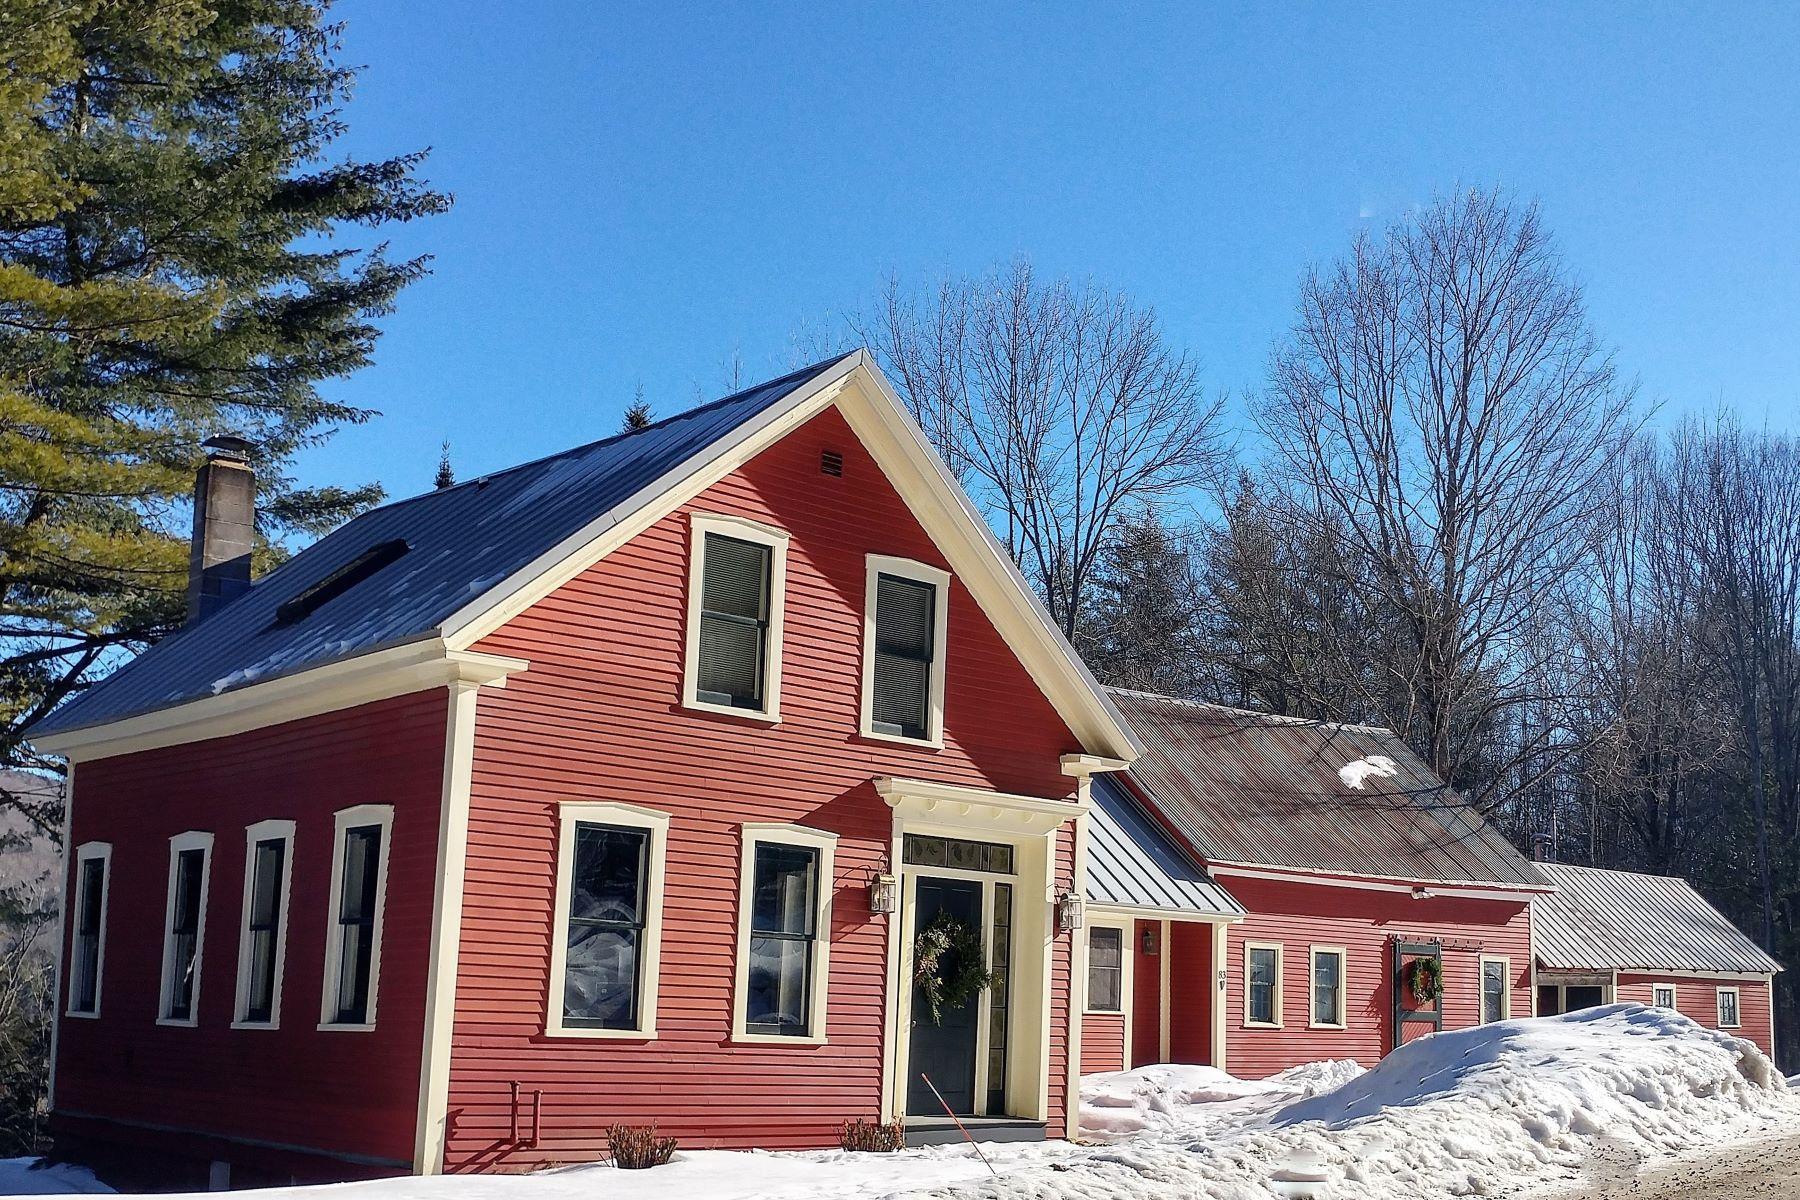 独户住宅 为 销售 在 Antique Farmhouse, river frontage, acreage 83 Webster, Roxbury, 佛蒙特州, 05669 美国